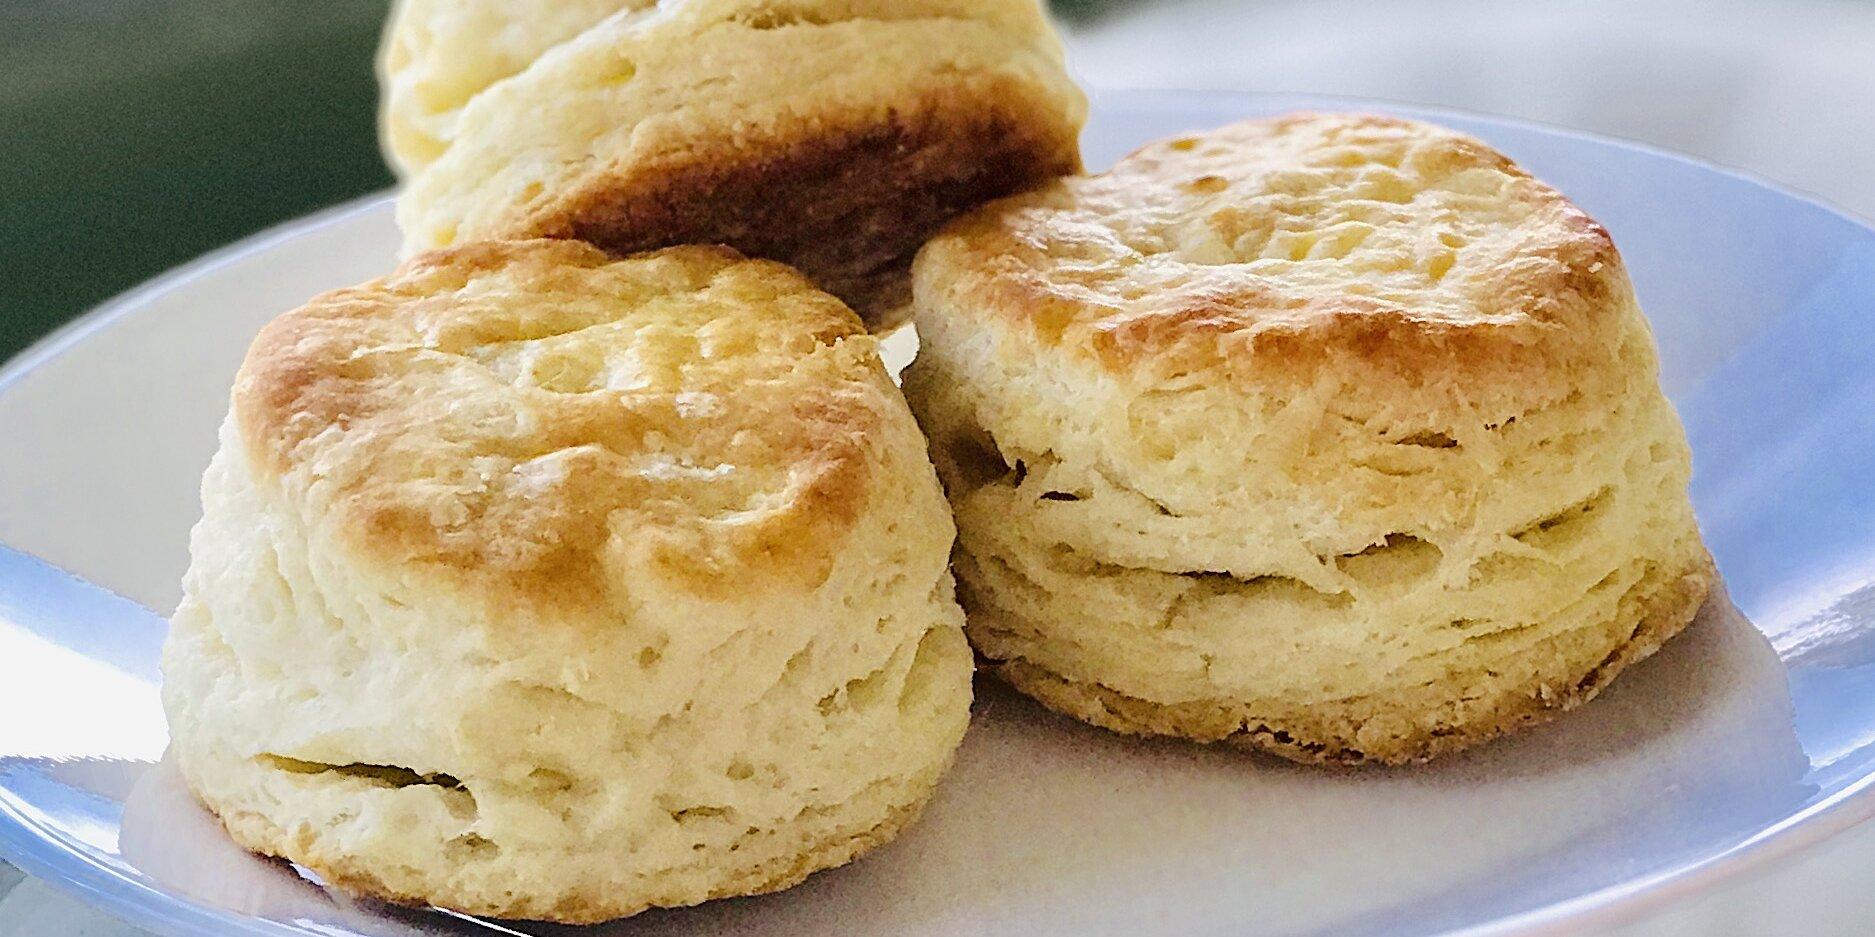 chef johns buttermilk biscuits